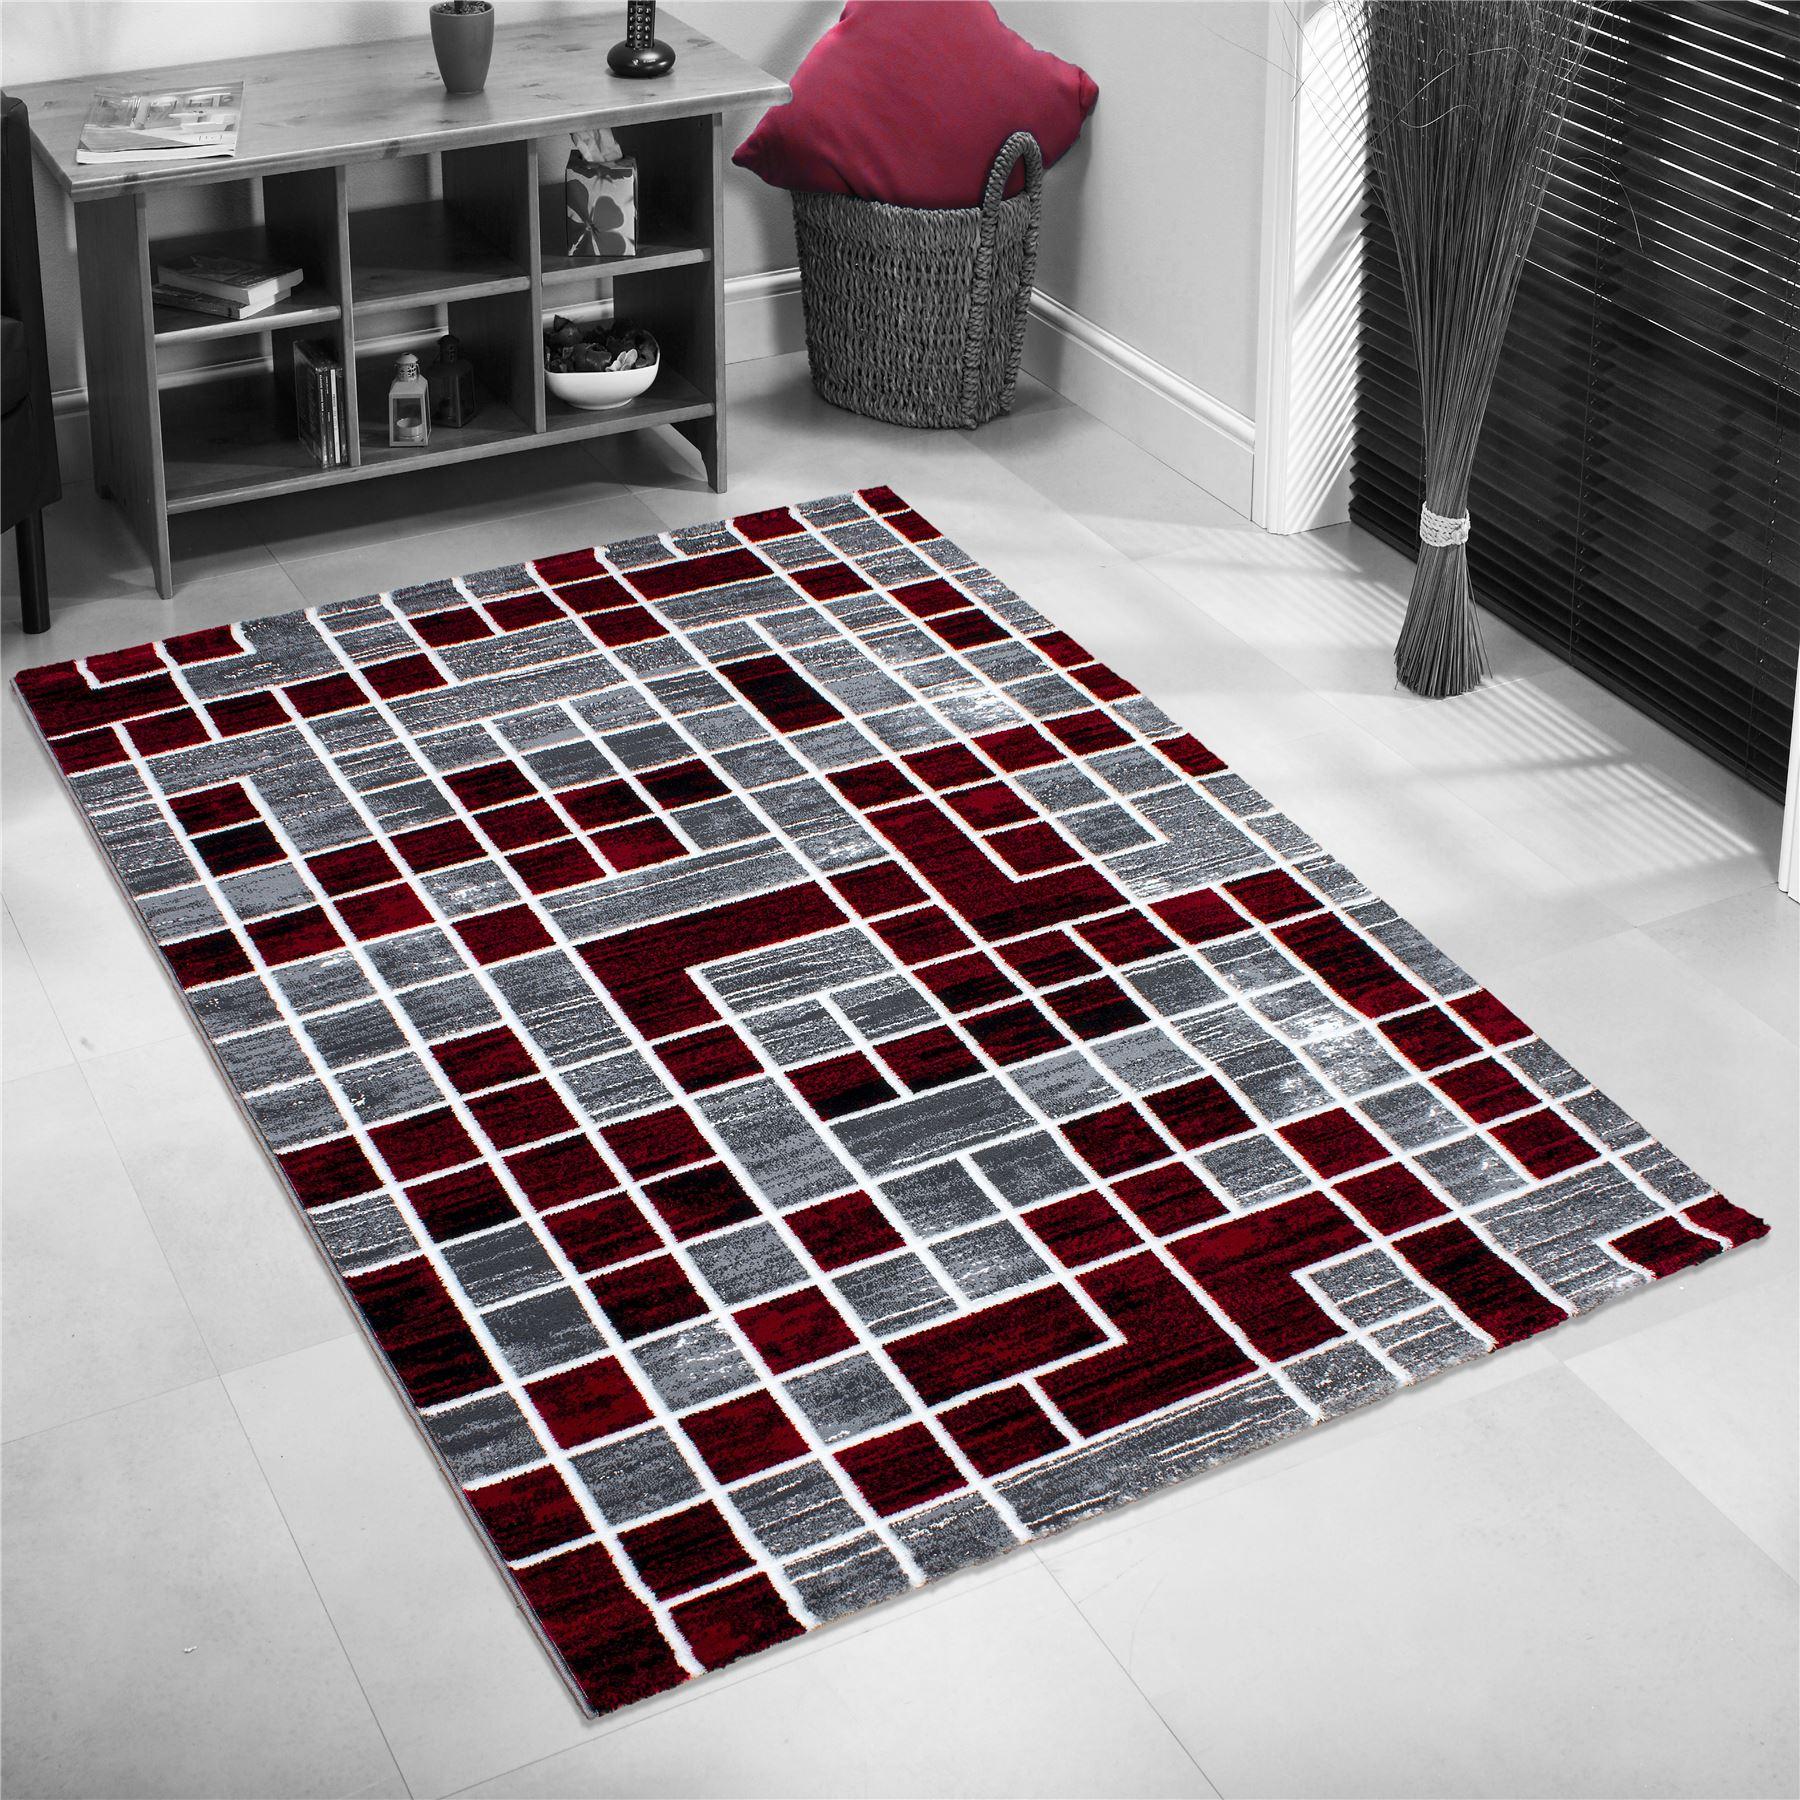 new modern contemporary squares border pixel black grey purple red  - newmoderncontemporarysquaresborderpixelblackgrey